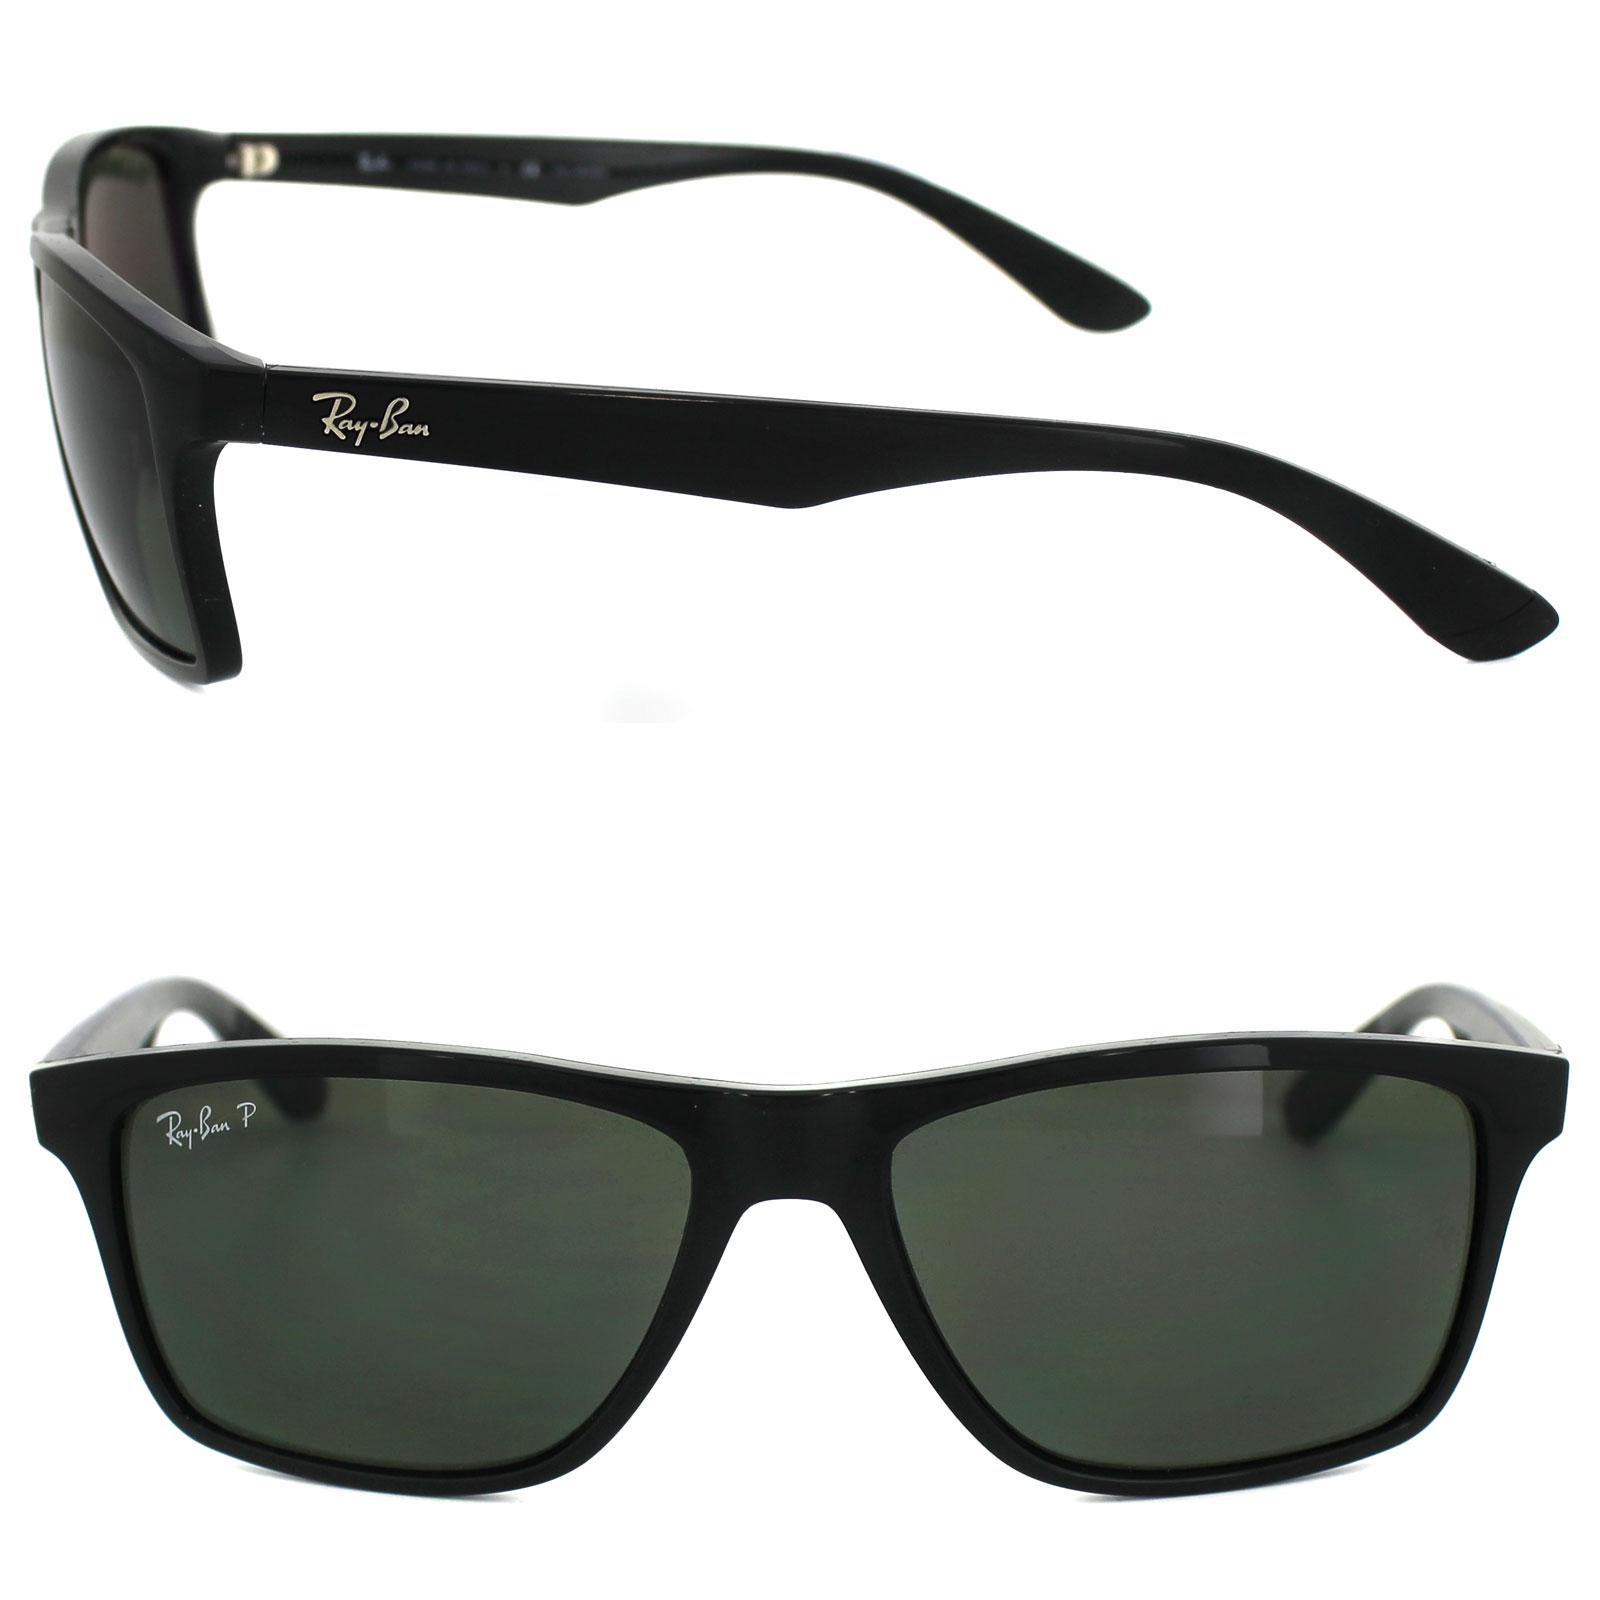 1d756e4dbde Ray-Ban Sunglasses 4234 601 9A Black Green Polarized 8053672497960 ...